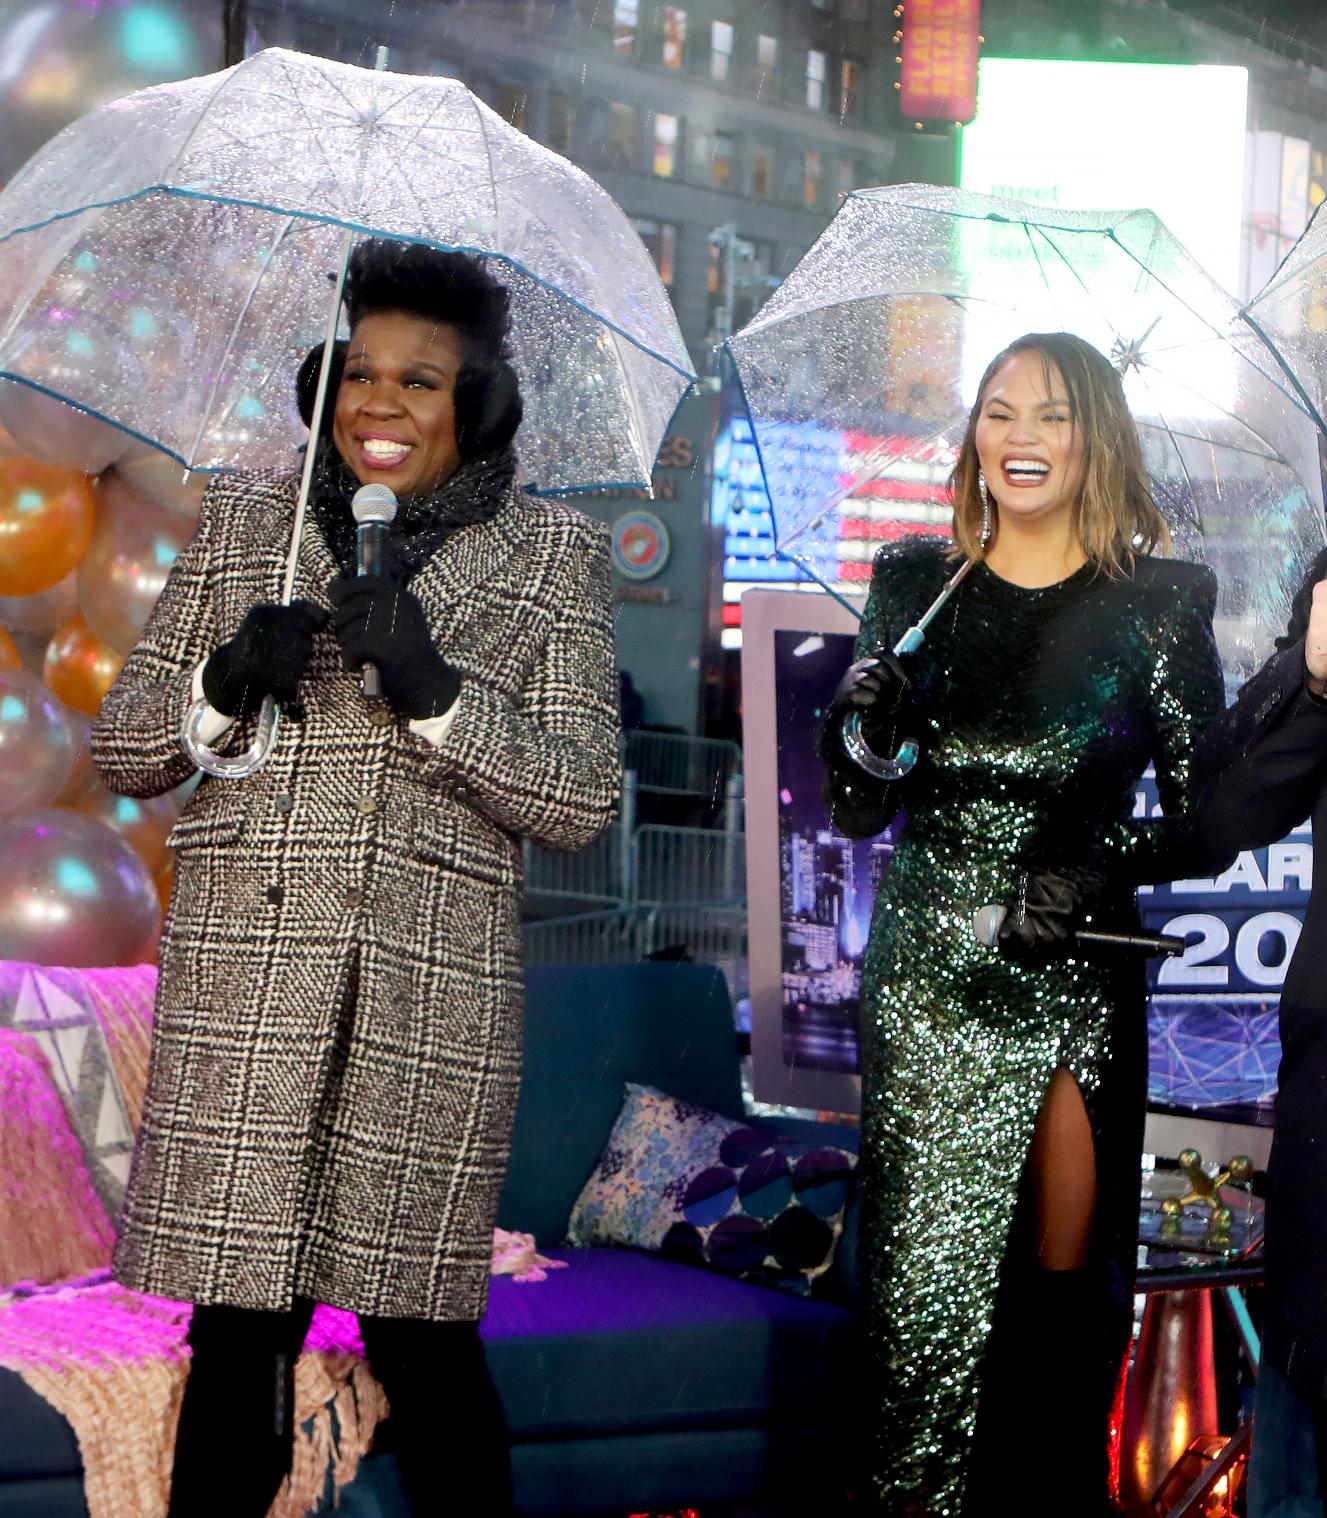 Leslie Jones Umbrella Hits Chrissy Teigen In The Face Reactions